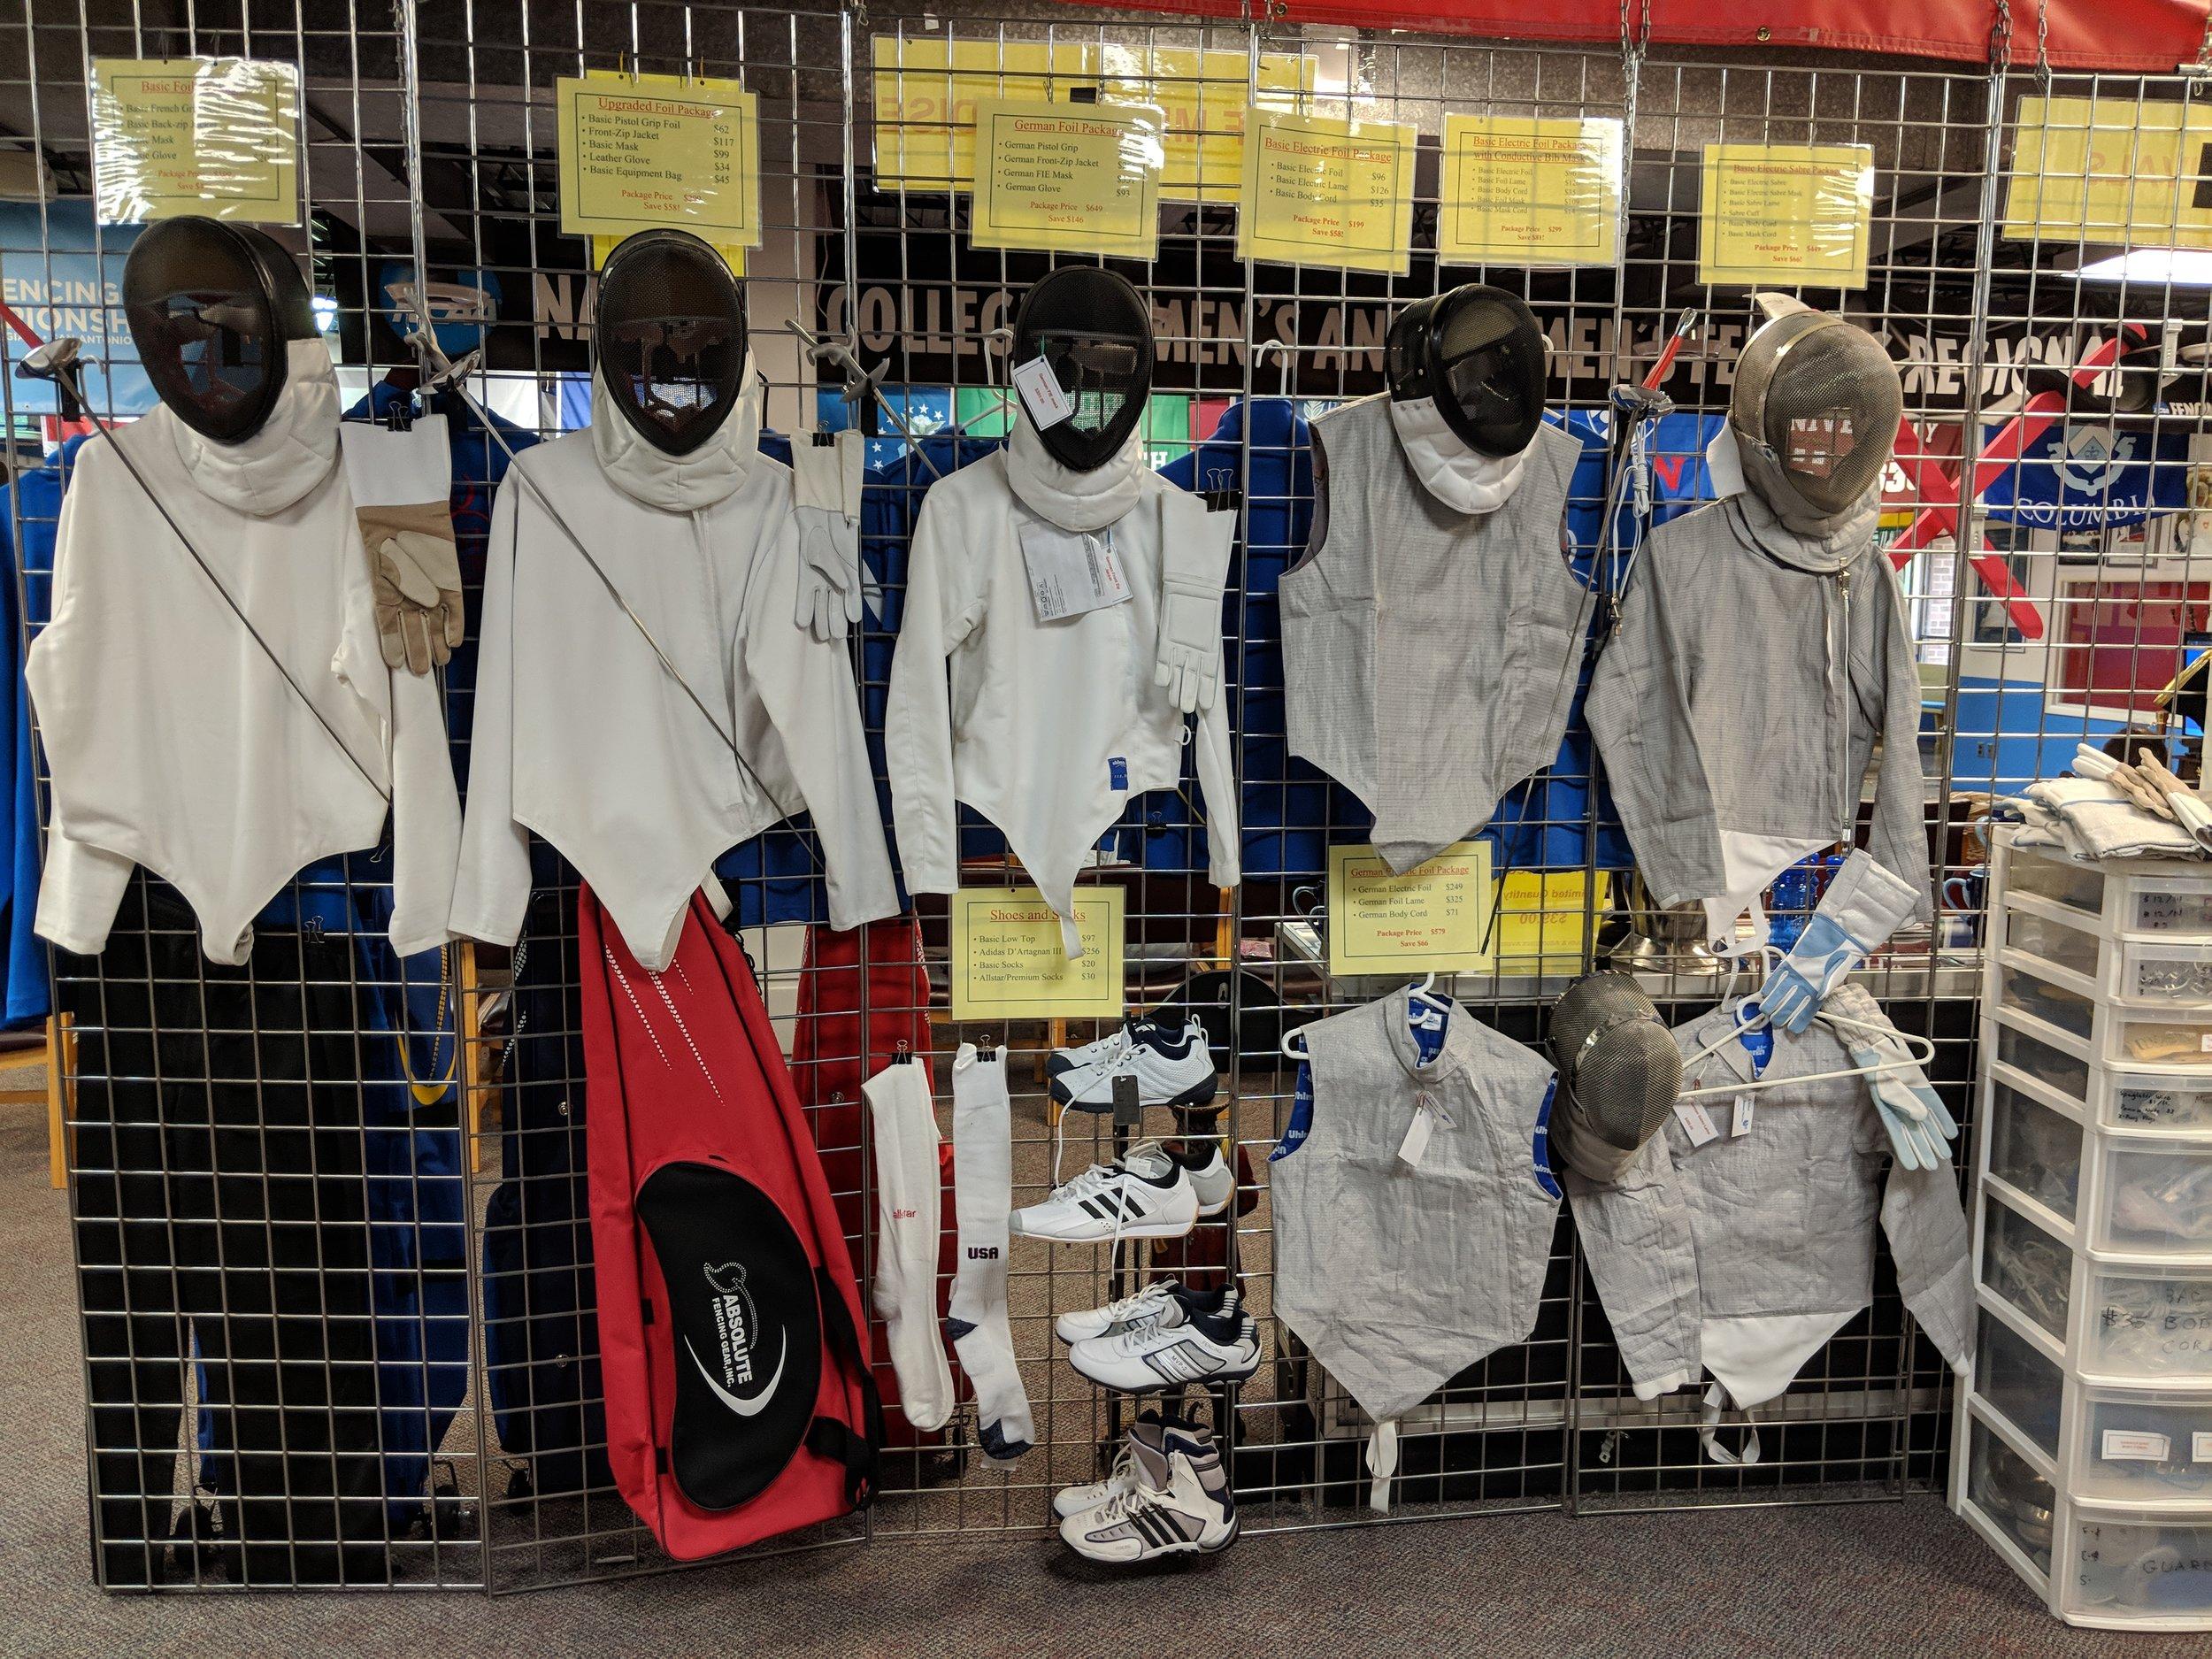 Olympic Sport Equipment